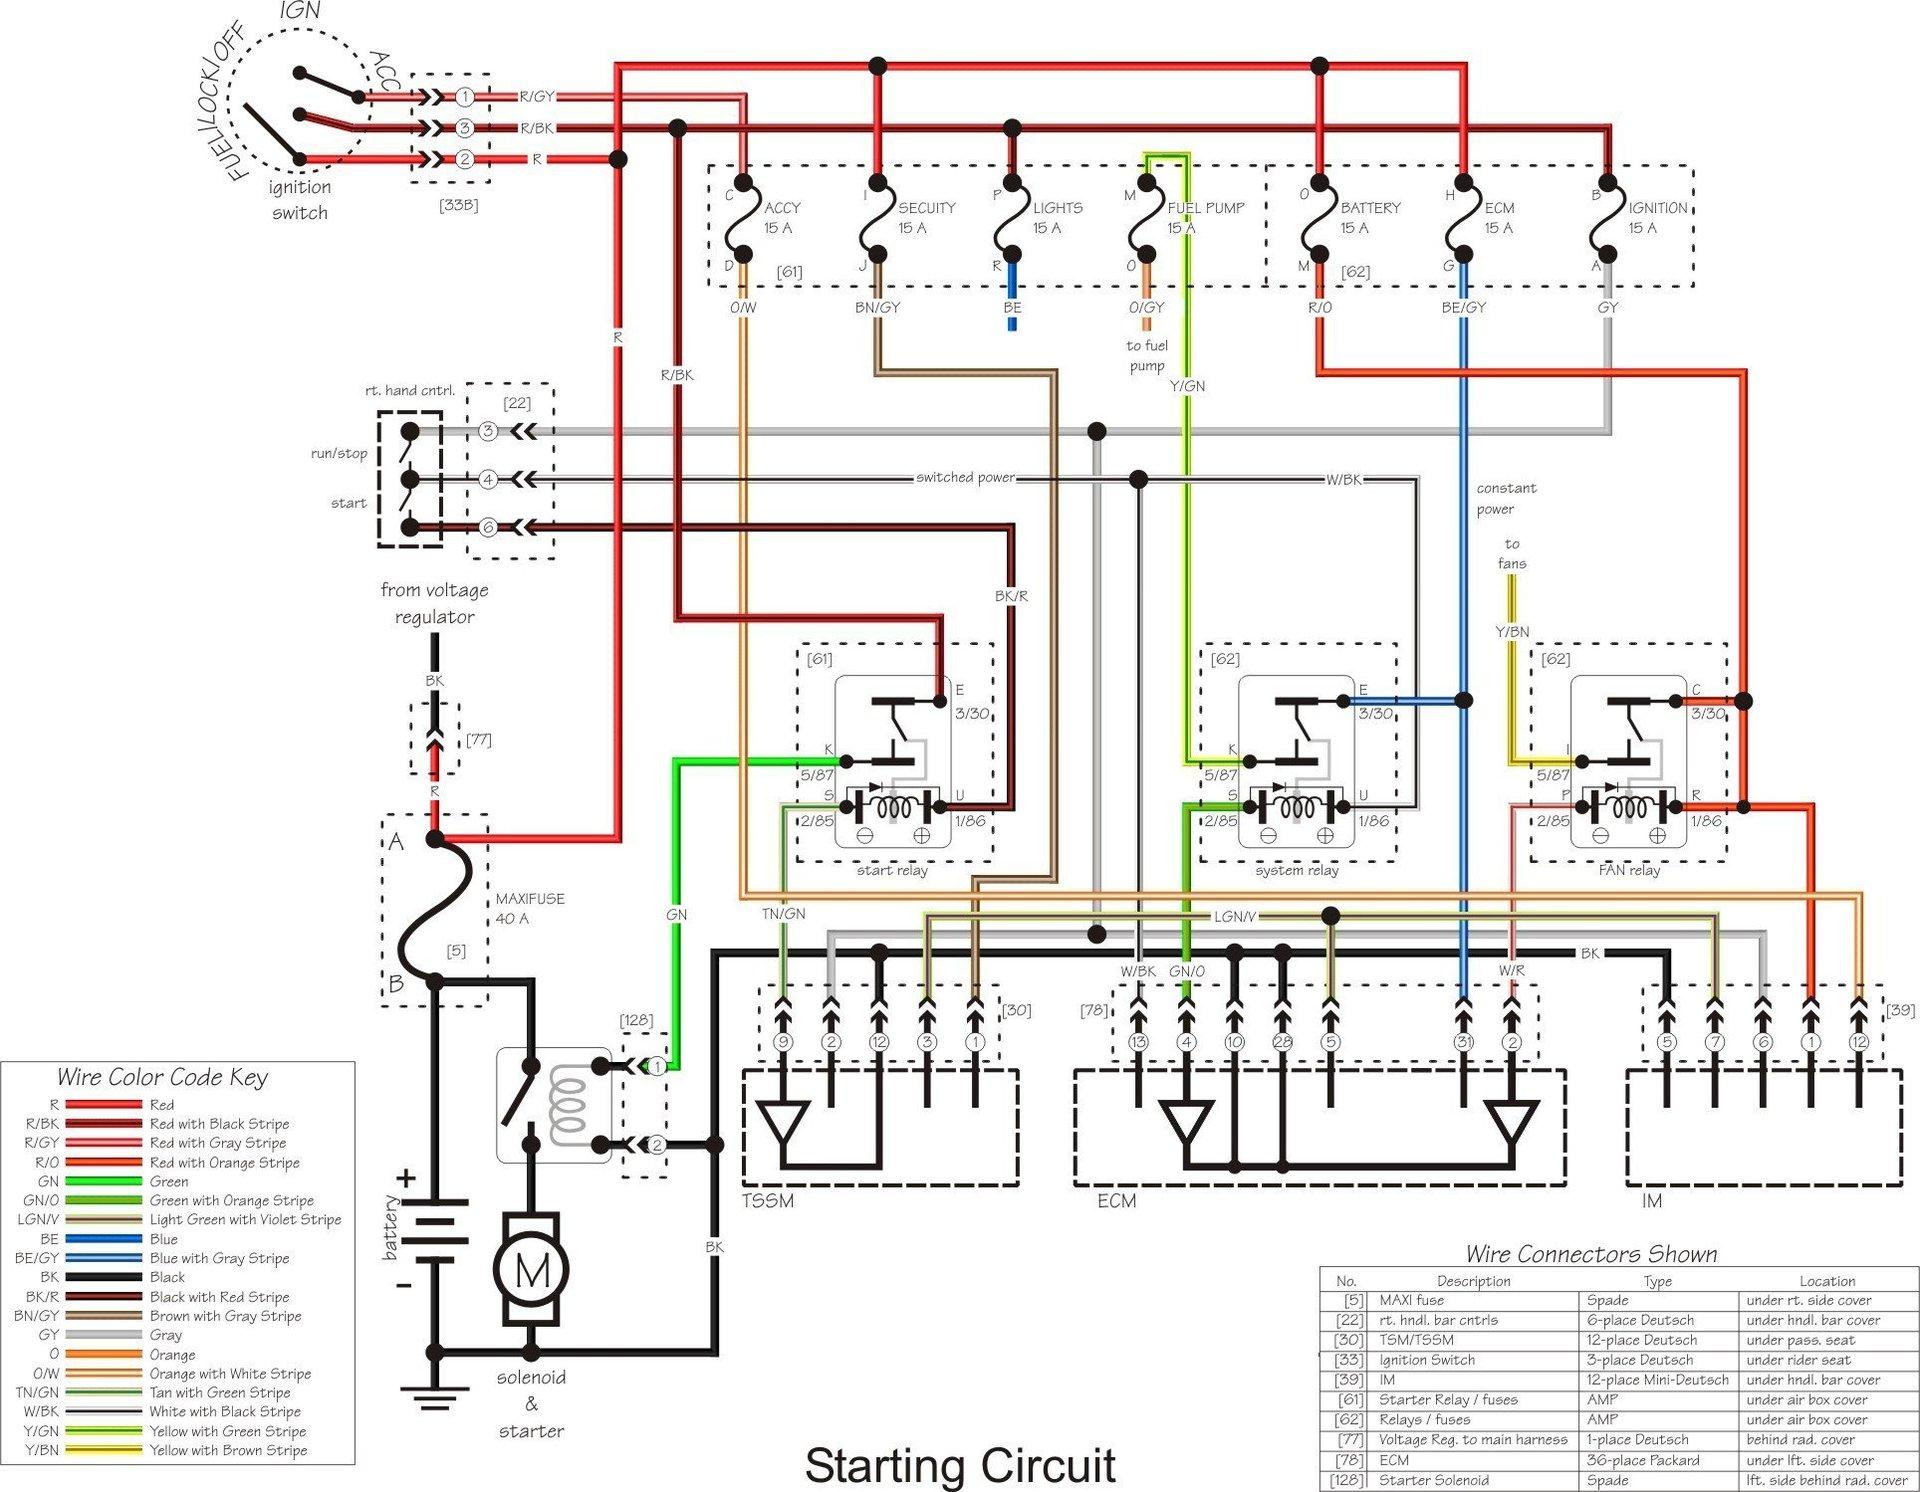 ignition wiring diagram | harley davidson v-rod forum  v-rod forum